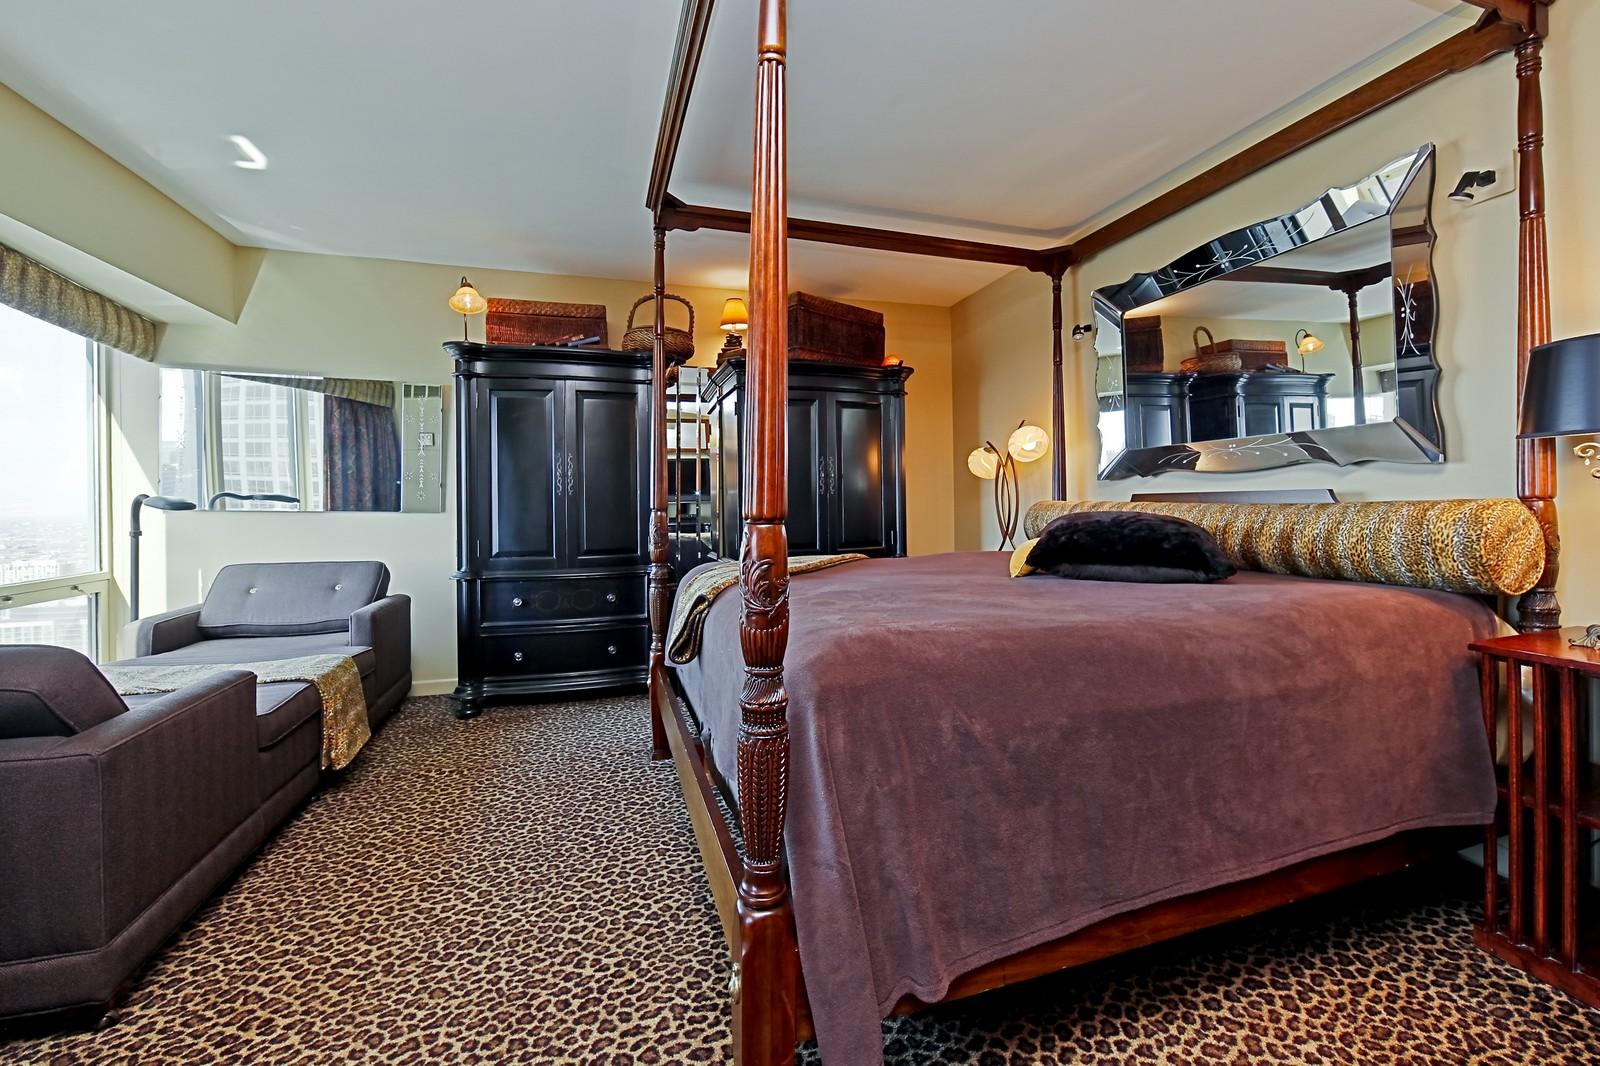 Real Estate Photography - 100 E Huron, Unit 4504, Chicago, IL, 60611 - Master Bedroom